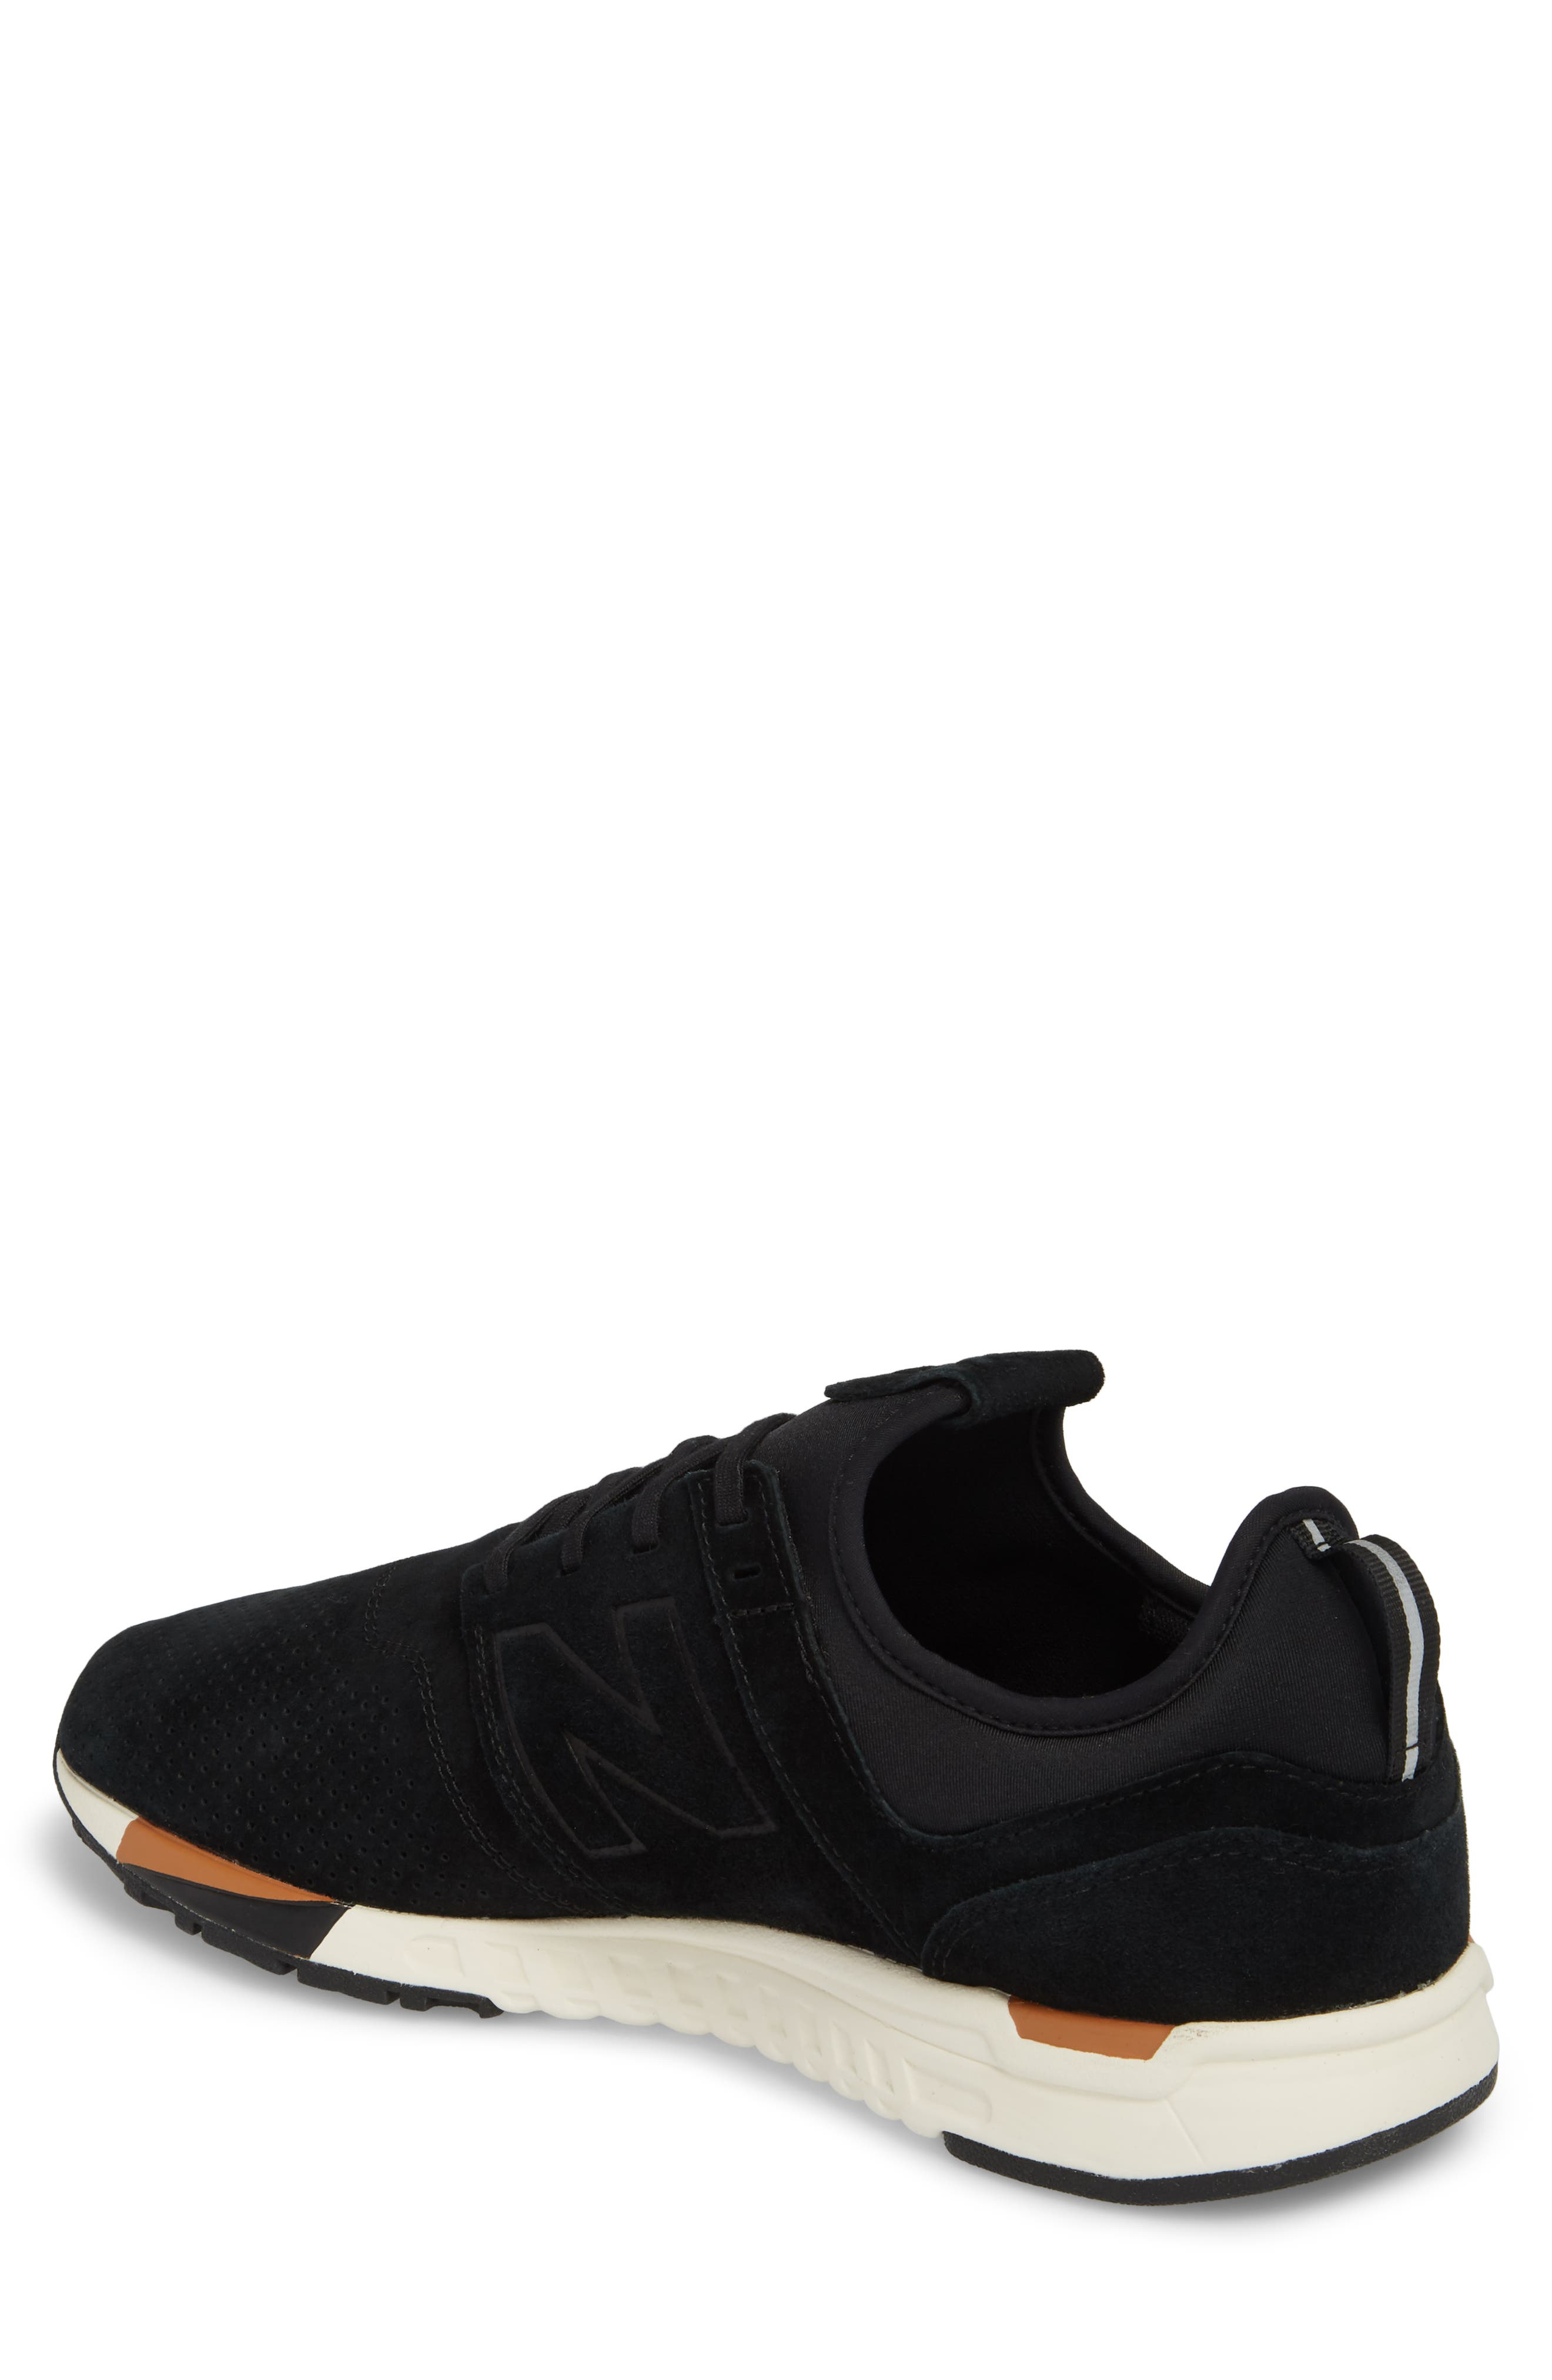 247 Luxe Sneaker,                             Alternate thumbnail 2, color,                             BLACK